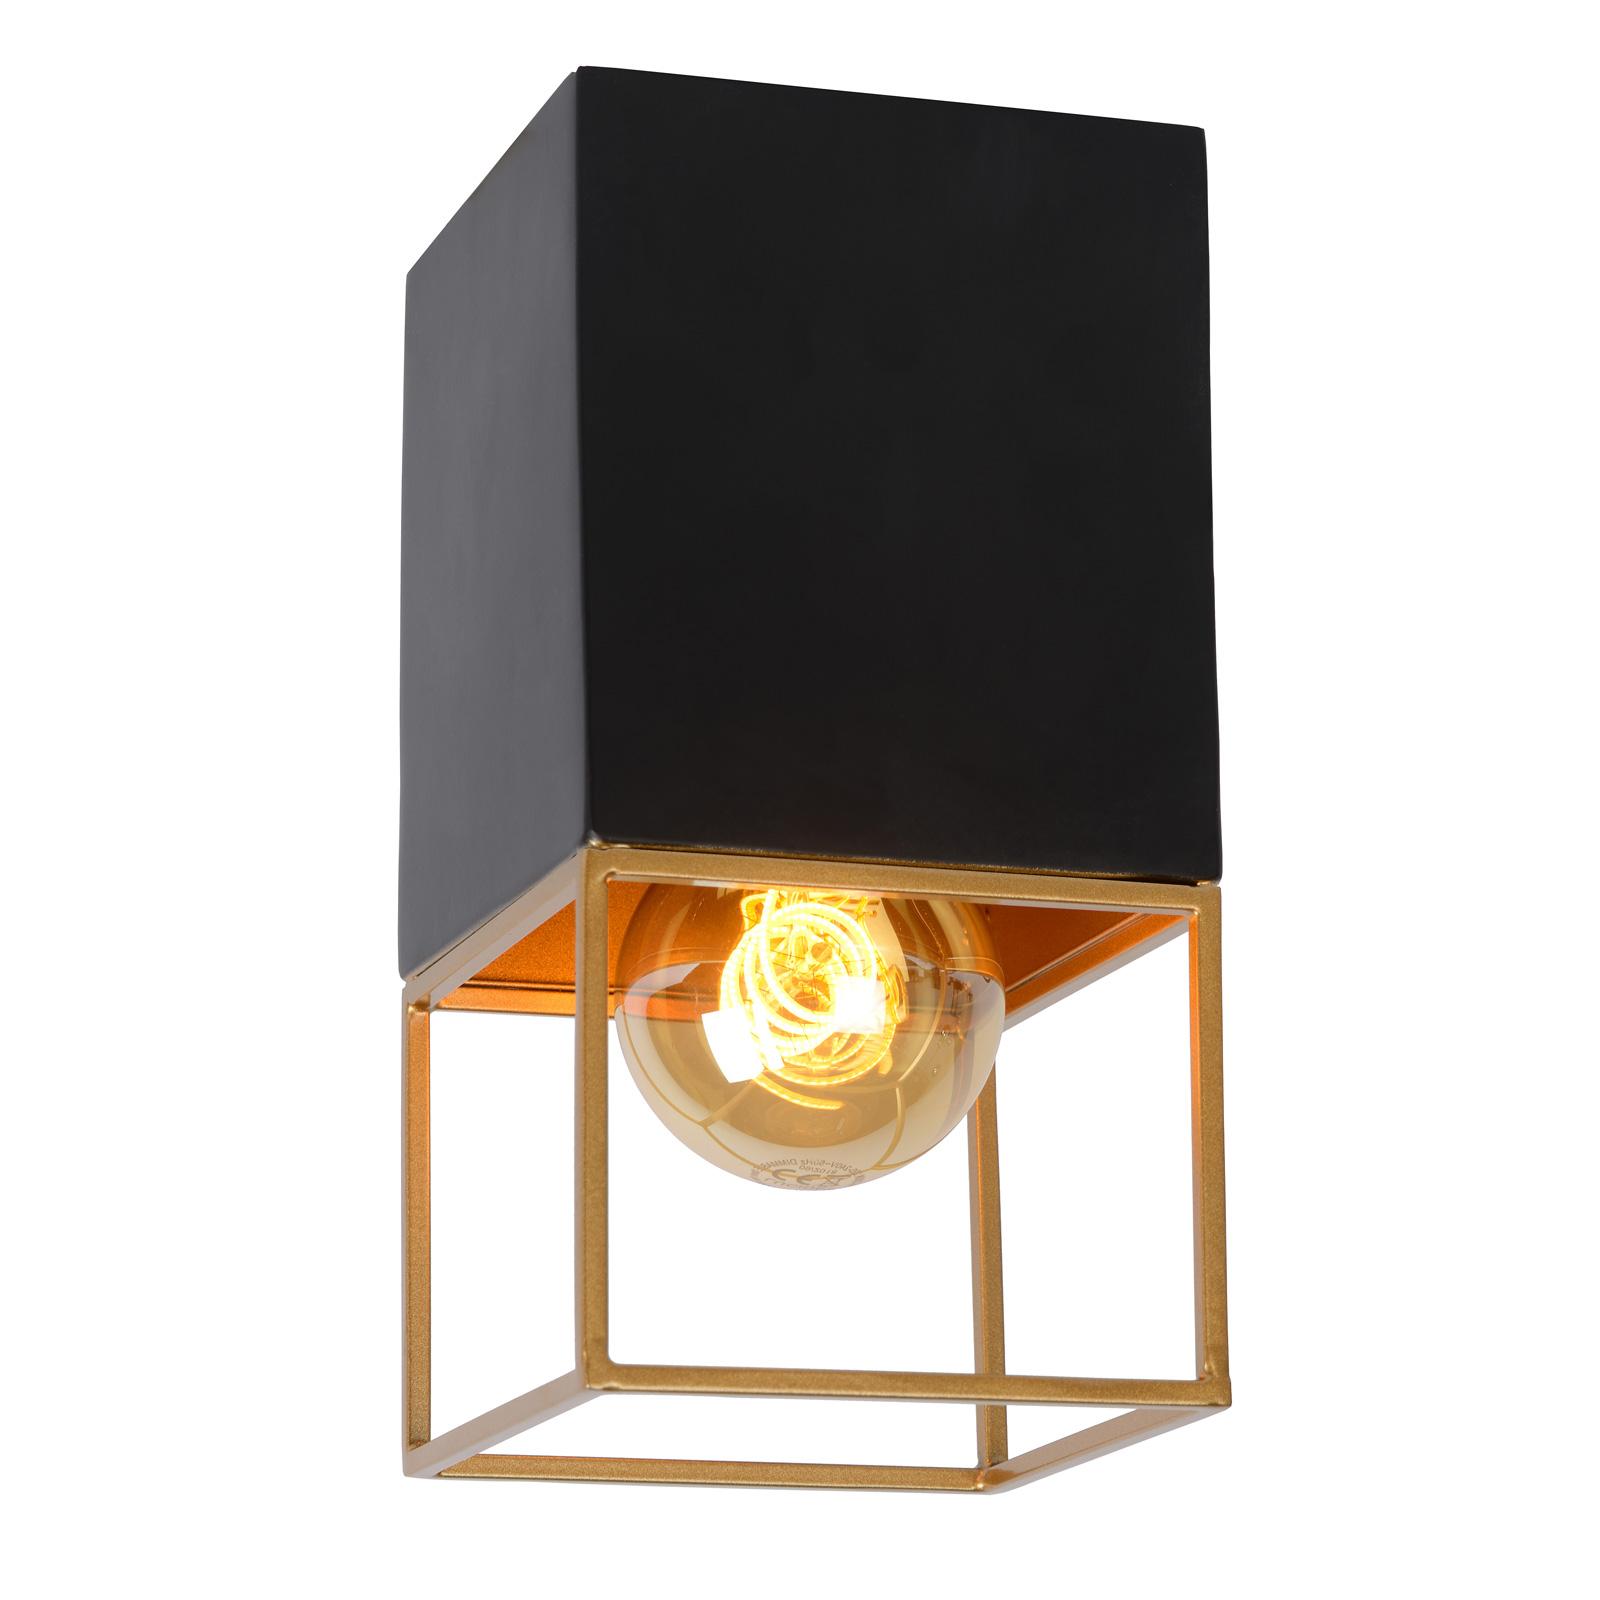 Lampa sufitowa Rixt czarna, kątowa, 1-punktowa